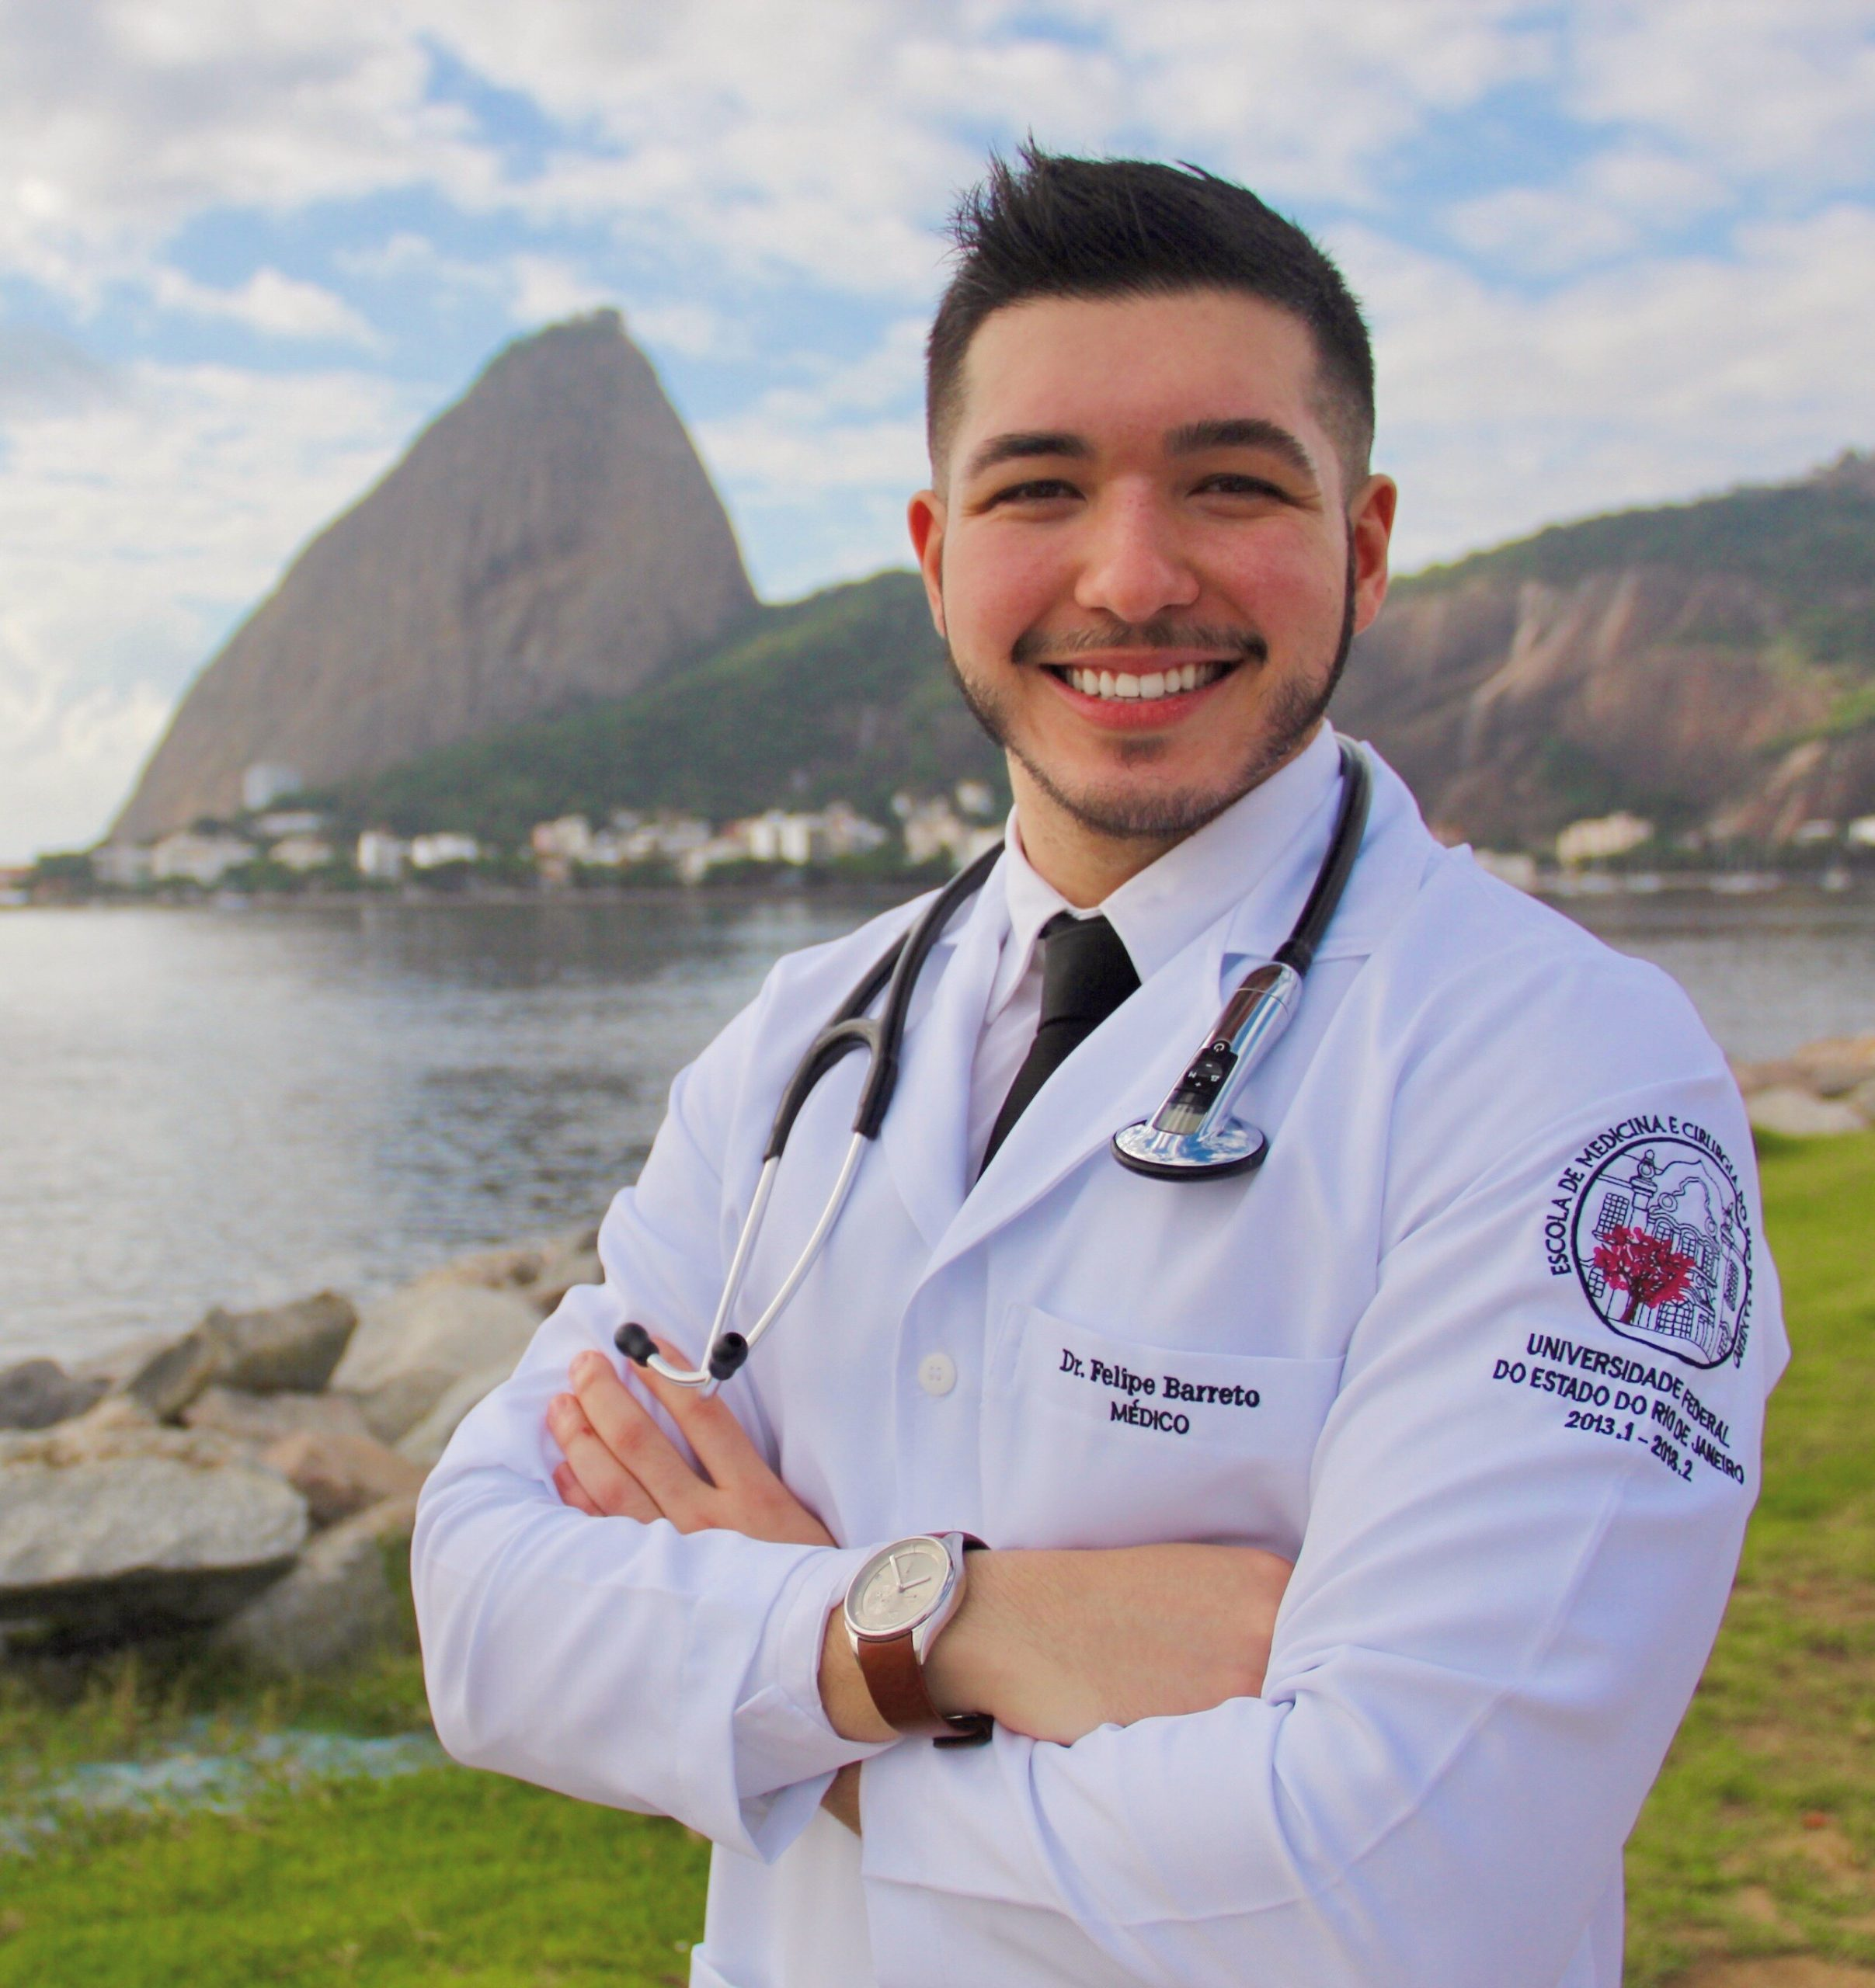 Dr Felipe Barreto